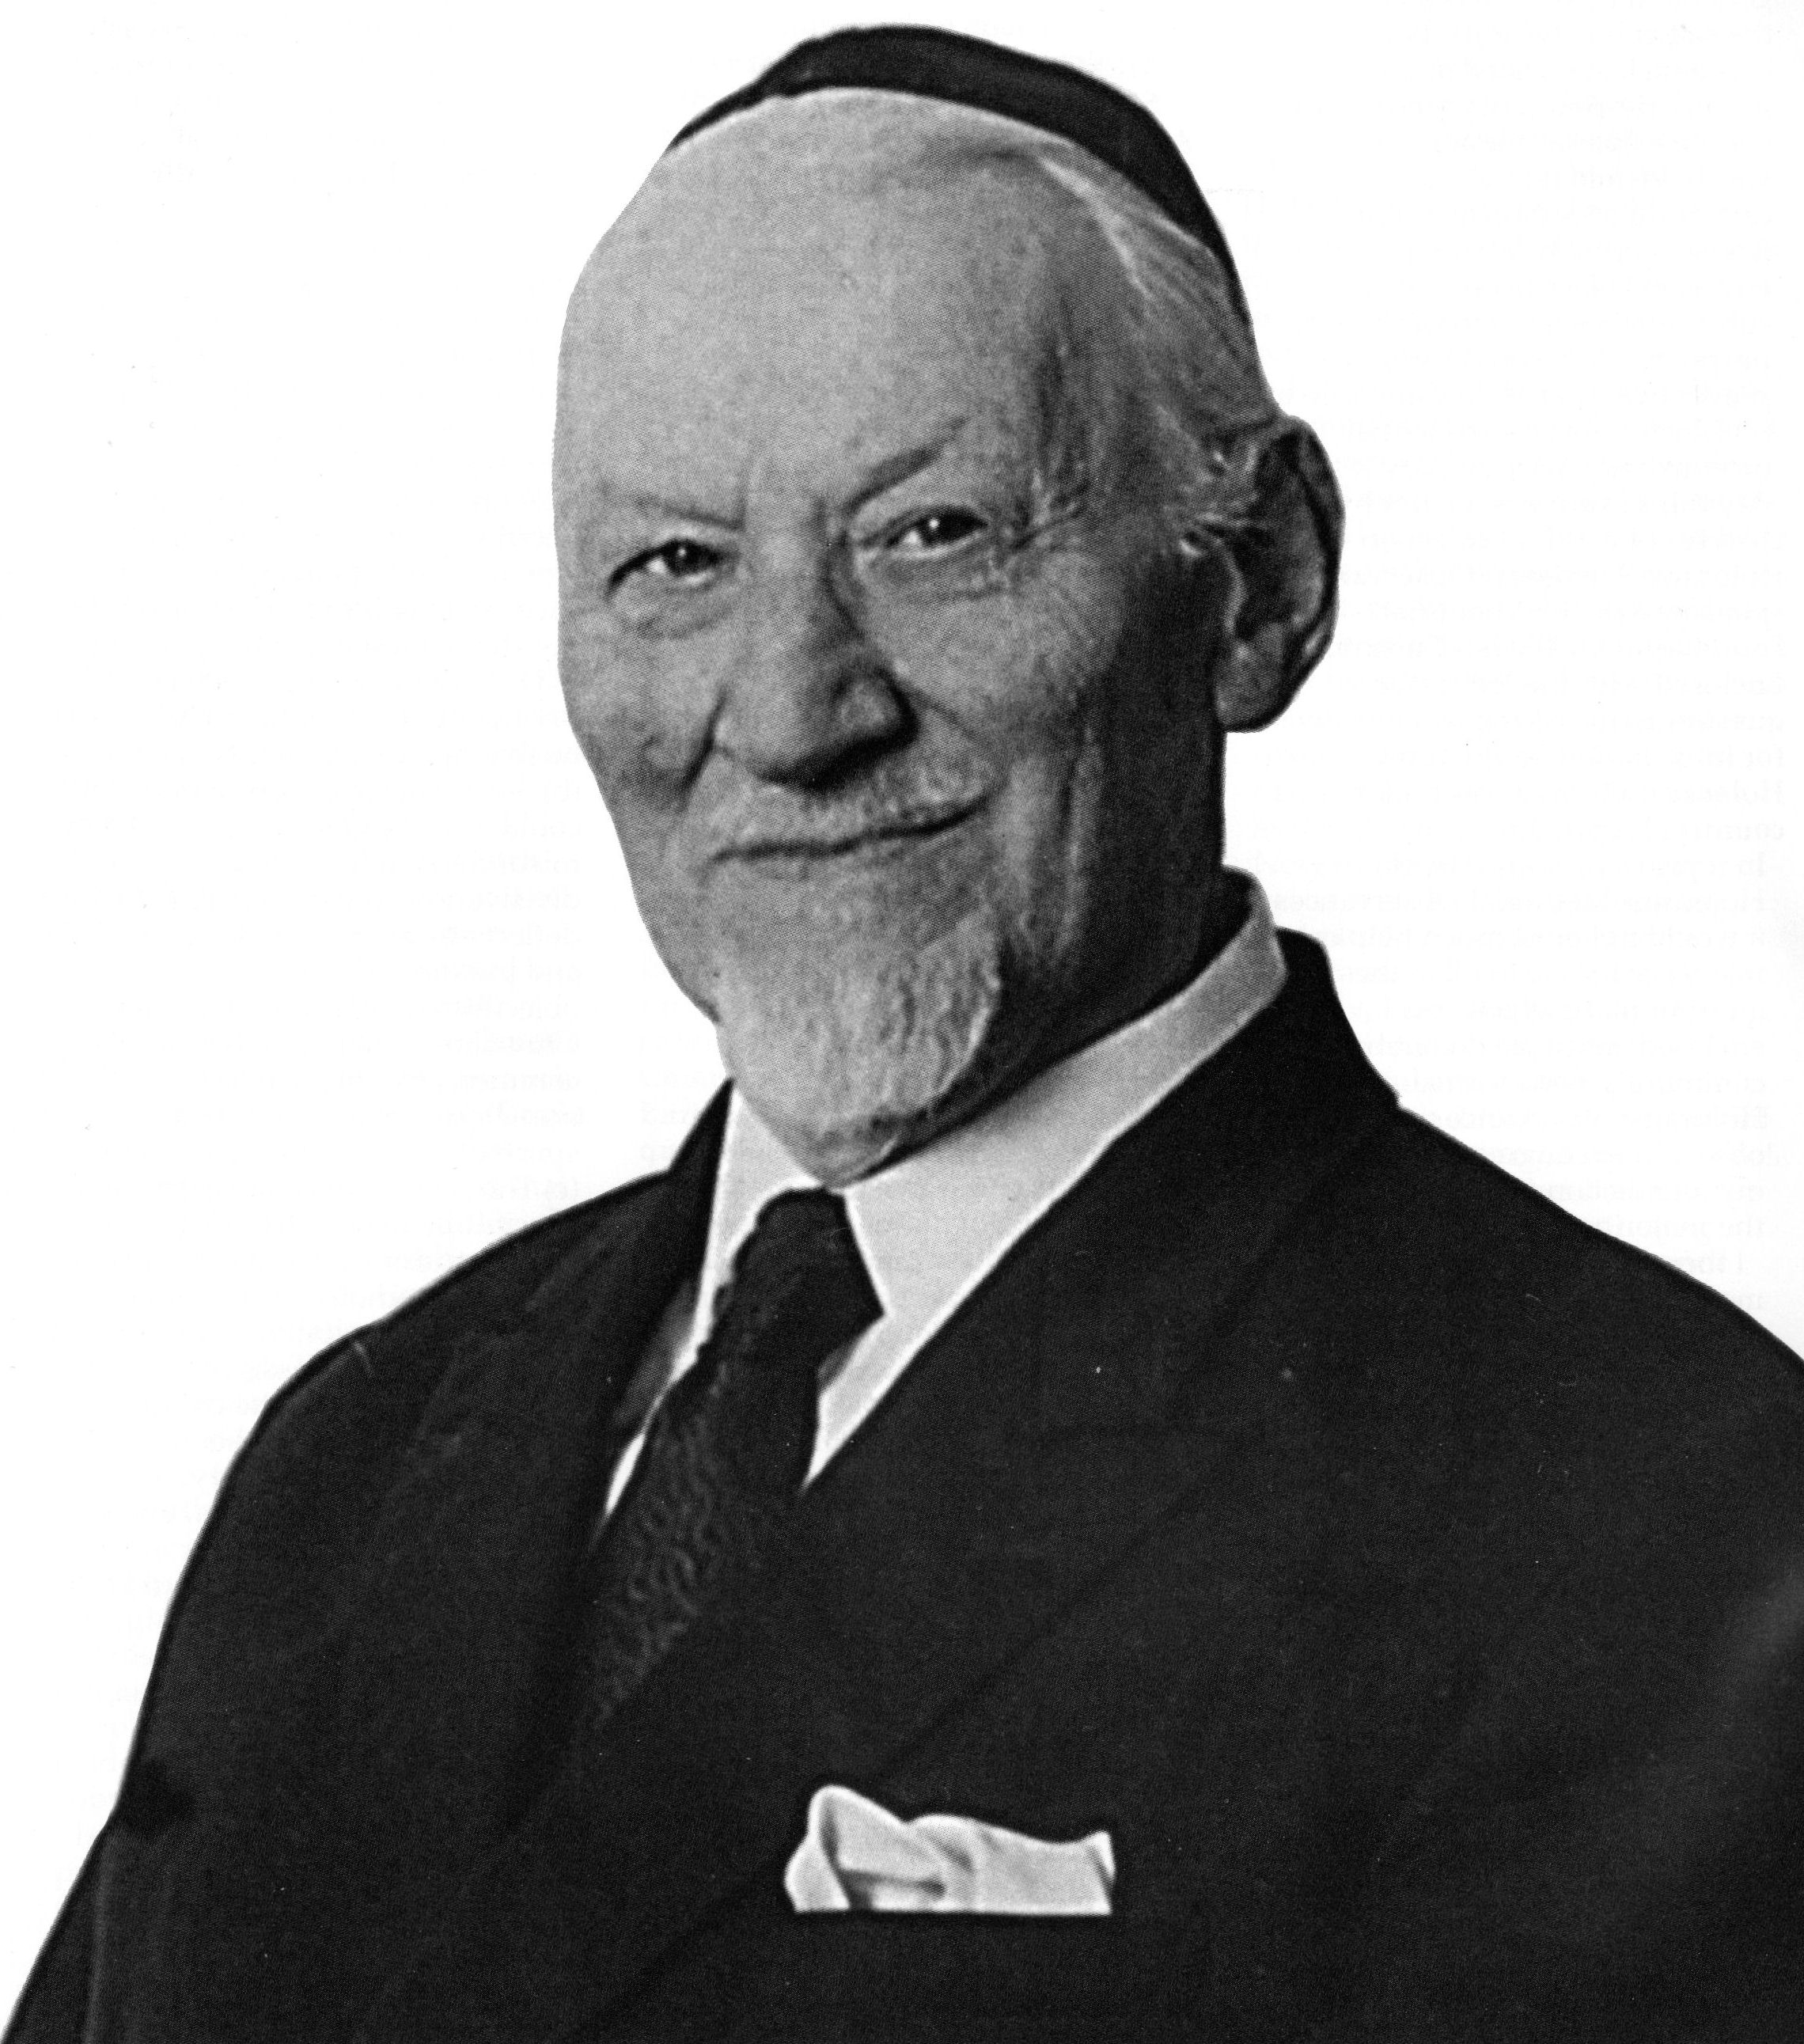 Leo Bryll 1906 - 1985